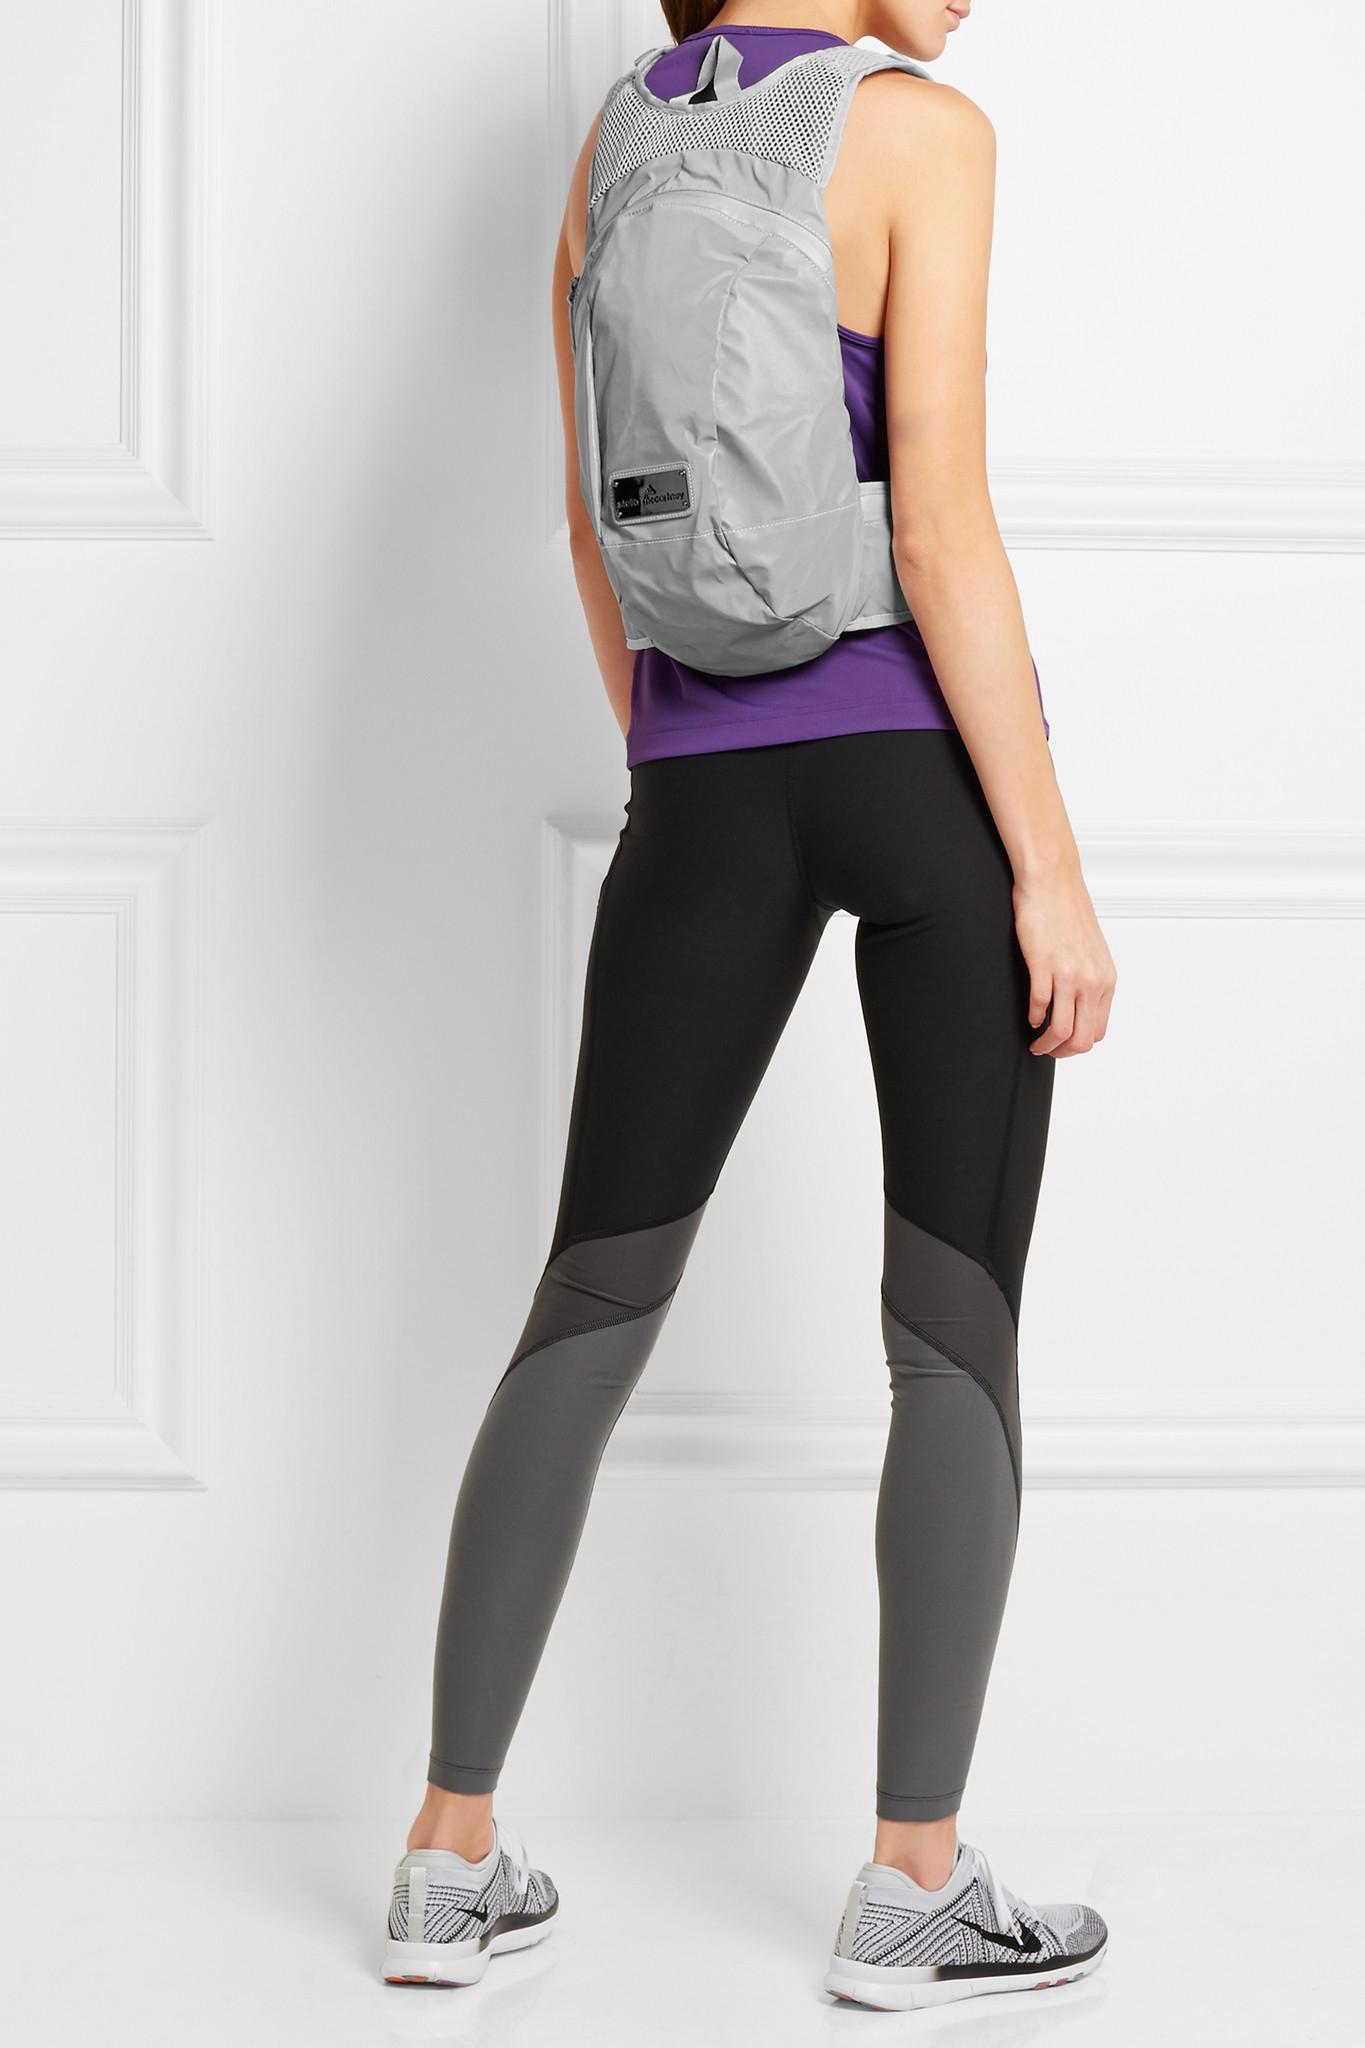 8da18ef027a8 Lyst - adidas By Stella McCartney Reflective Shell And Mesh Backpack ...